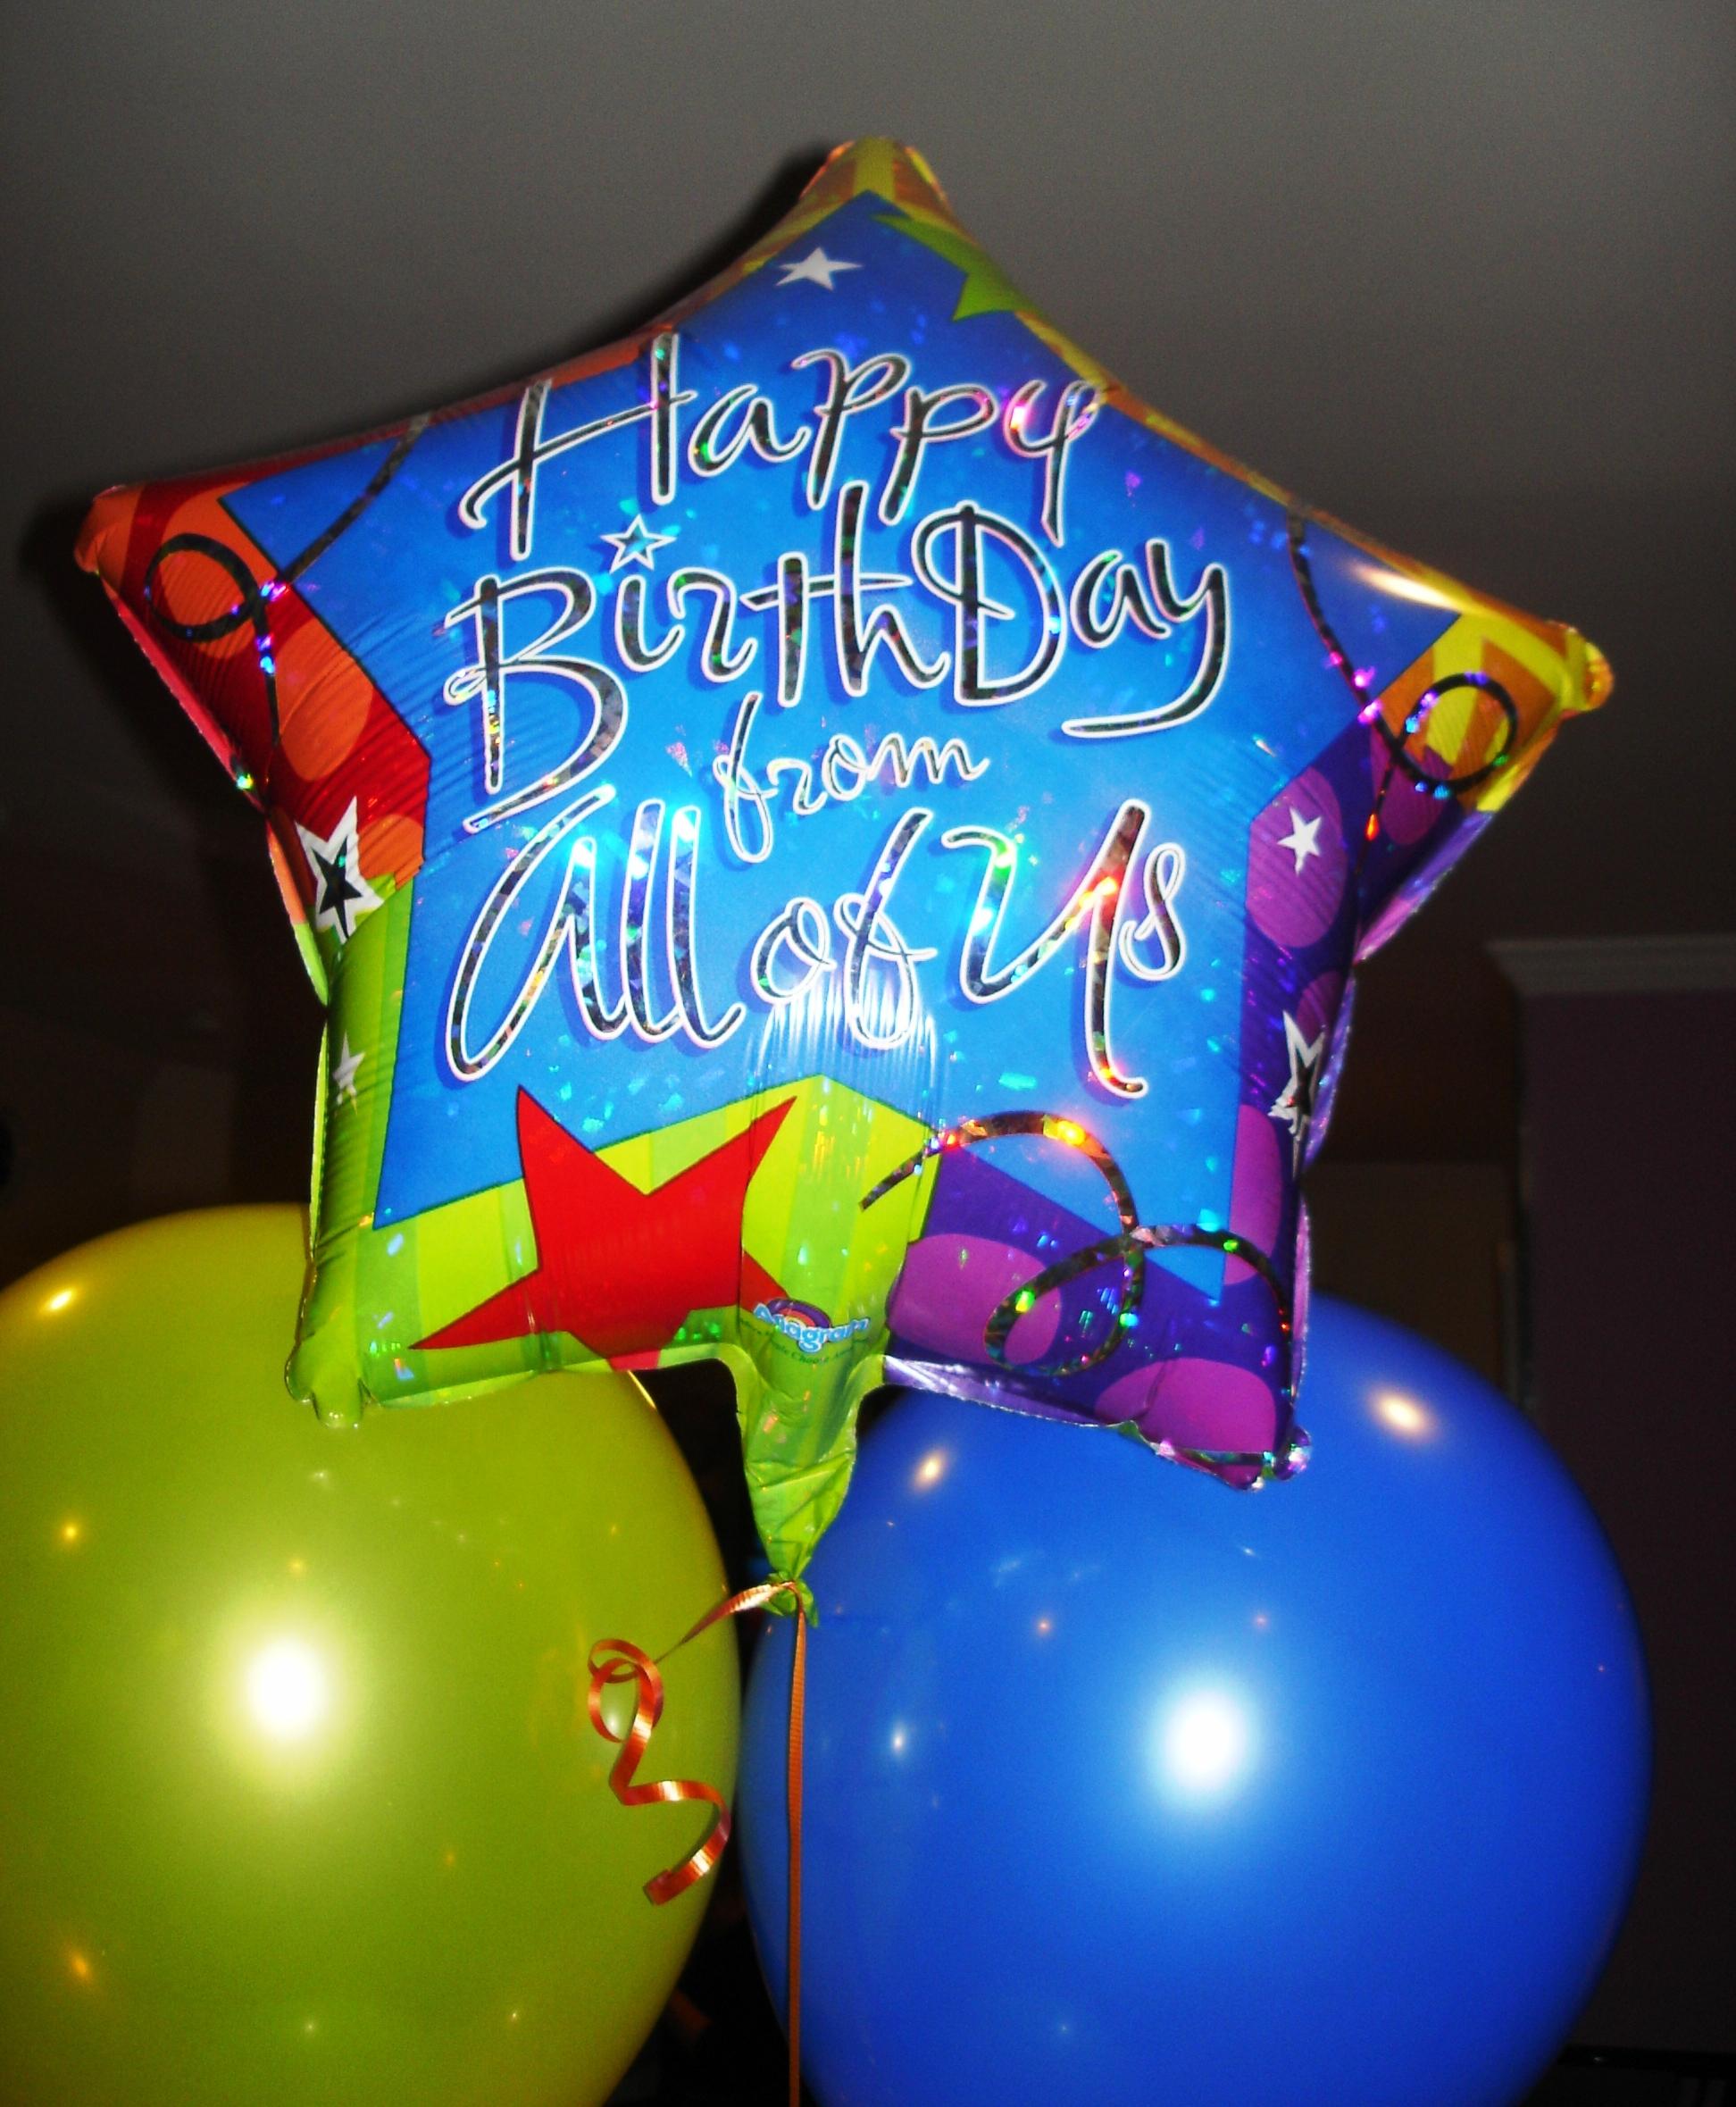 Phyllis 65th Birthday 002